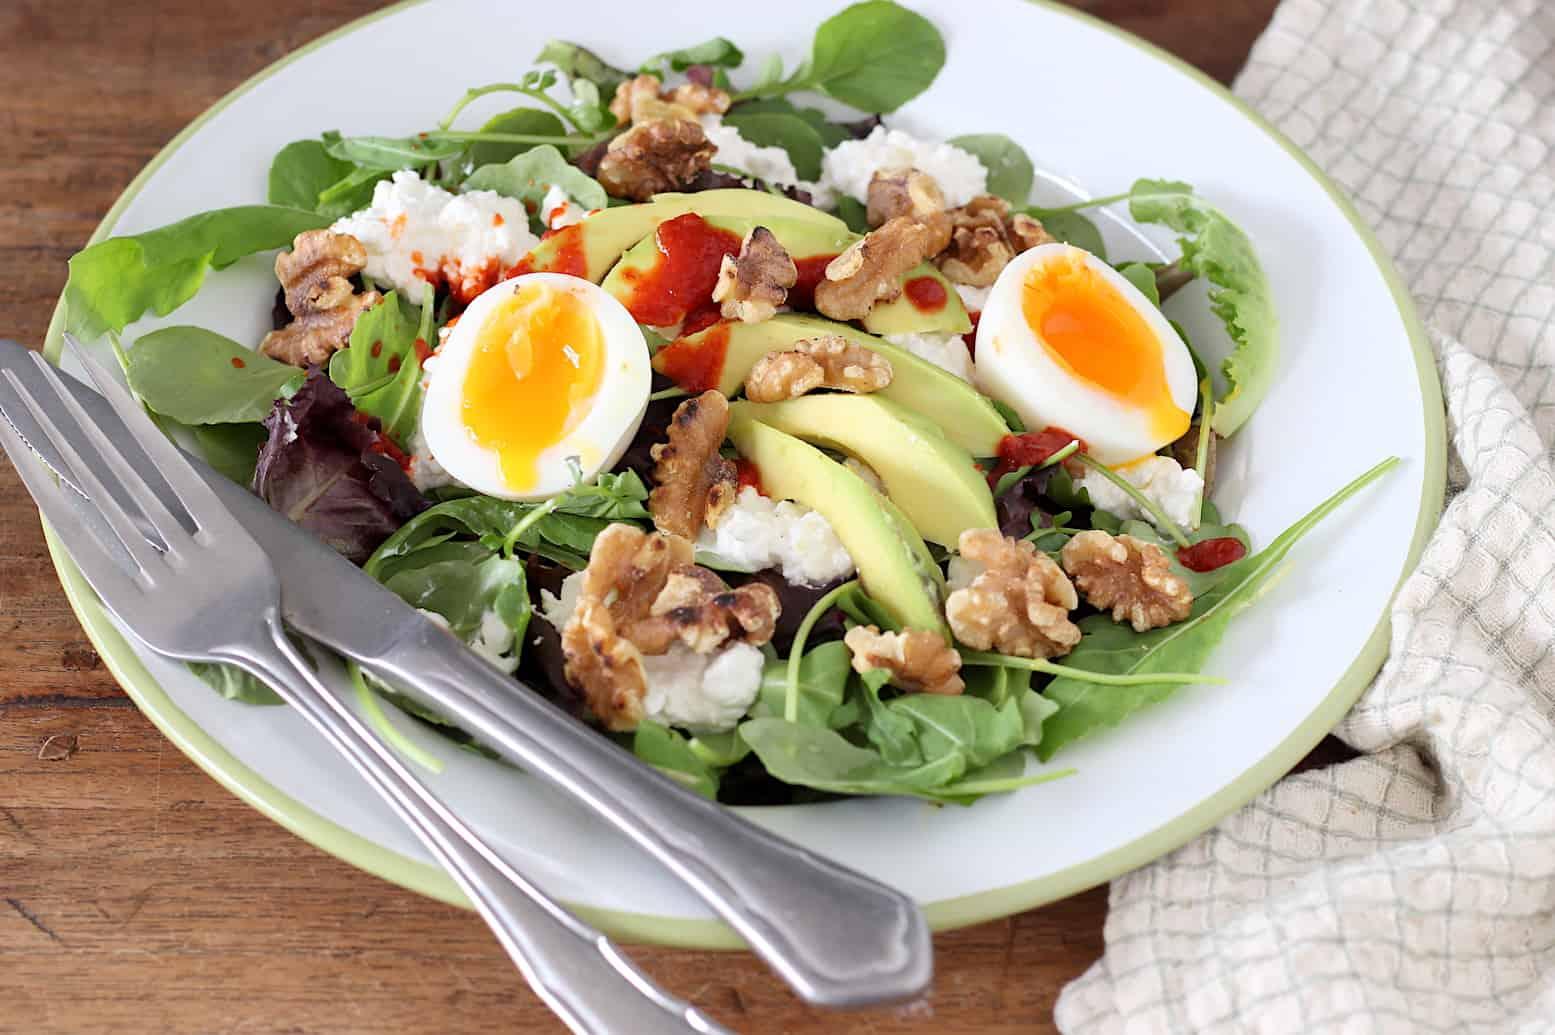 Salade met avocado, ei en sriracha online diëtist